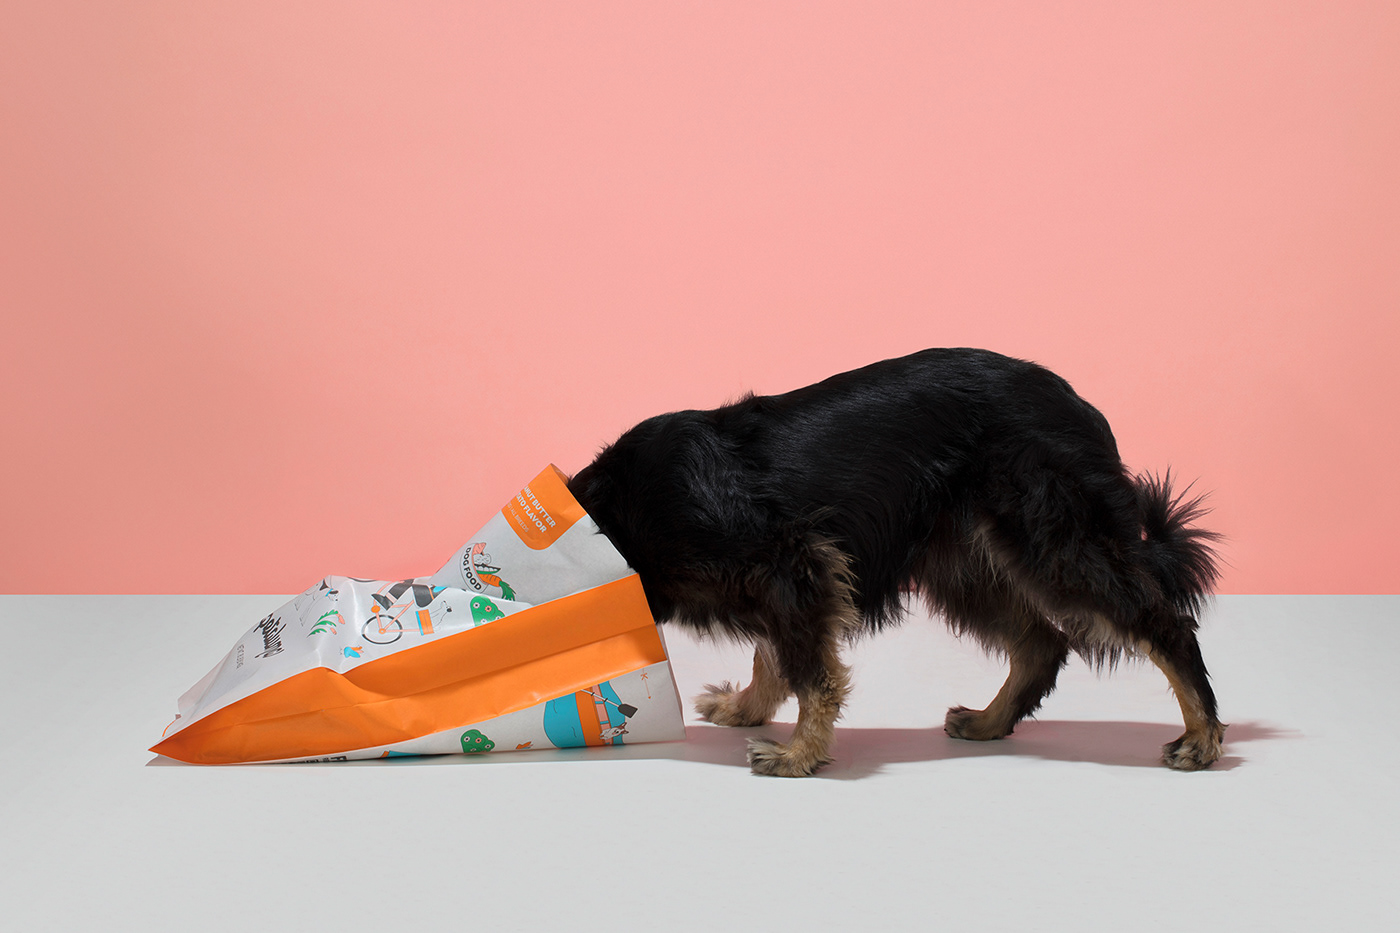 branding  dog dog food ILLUSTRATION  pets sweet potato vegan vegan dog food bowl peanut butter